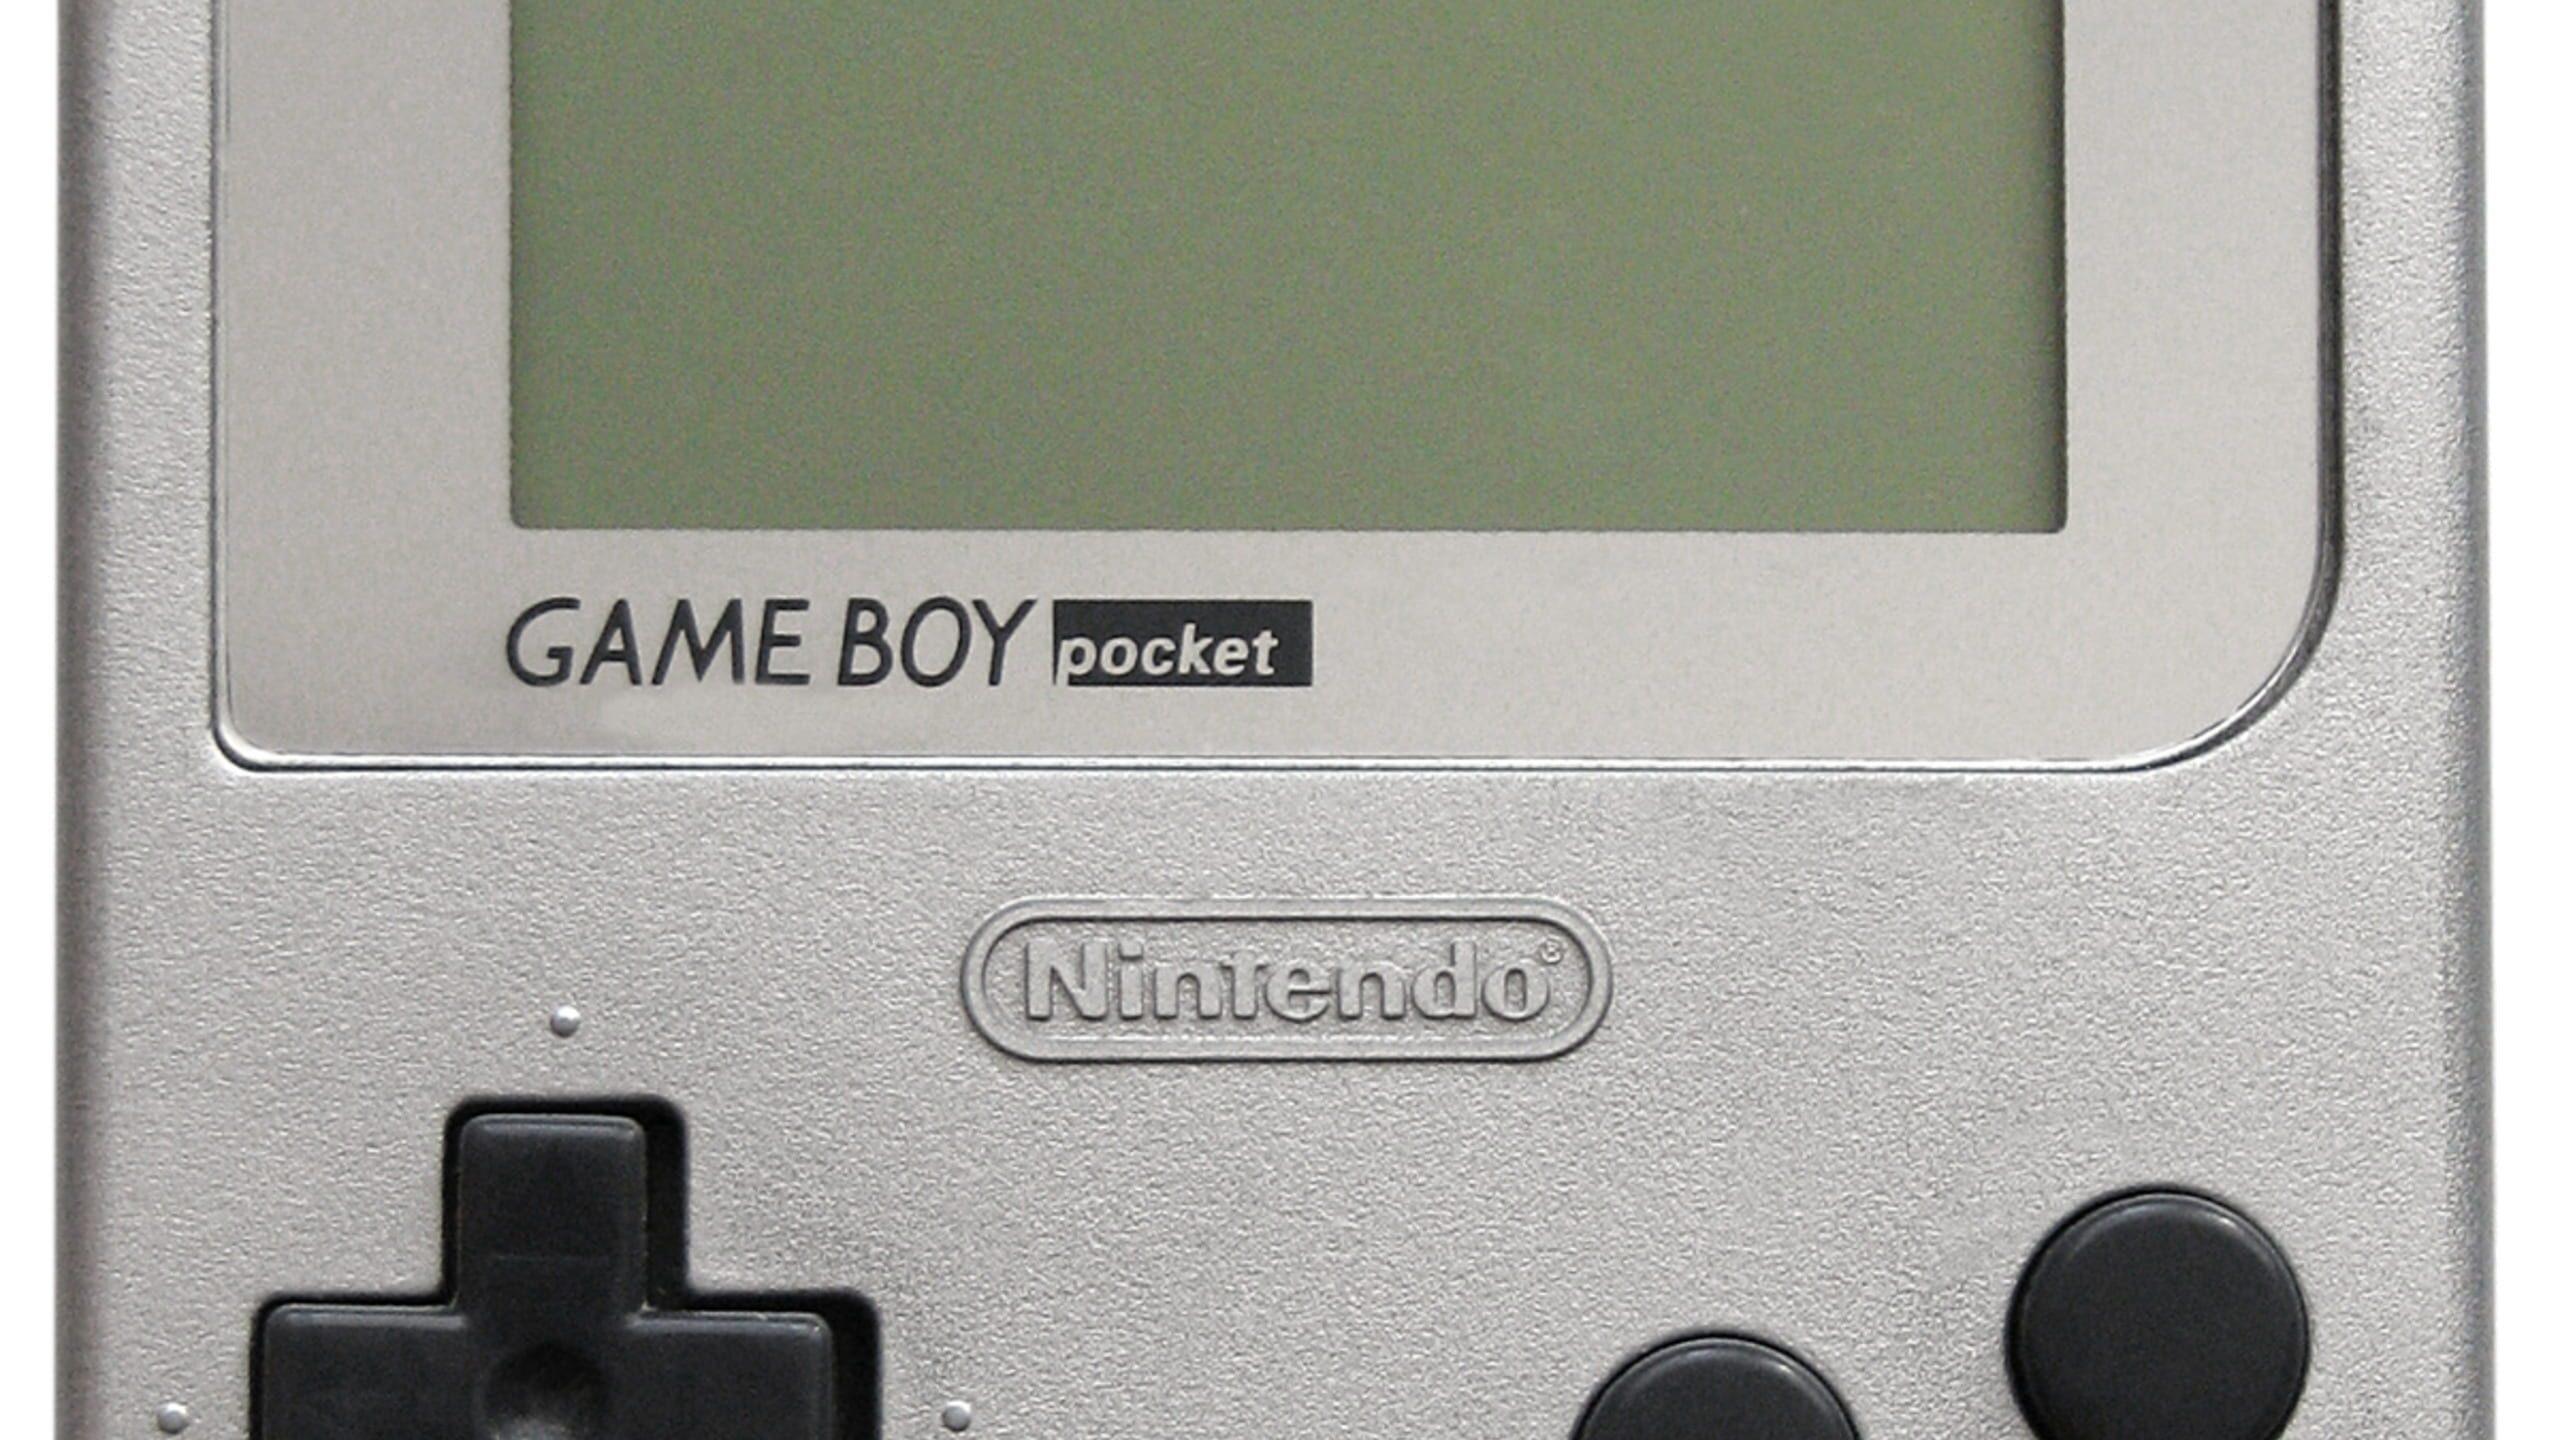 Game Boy - Game Boy Pocket